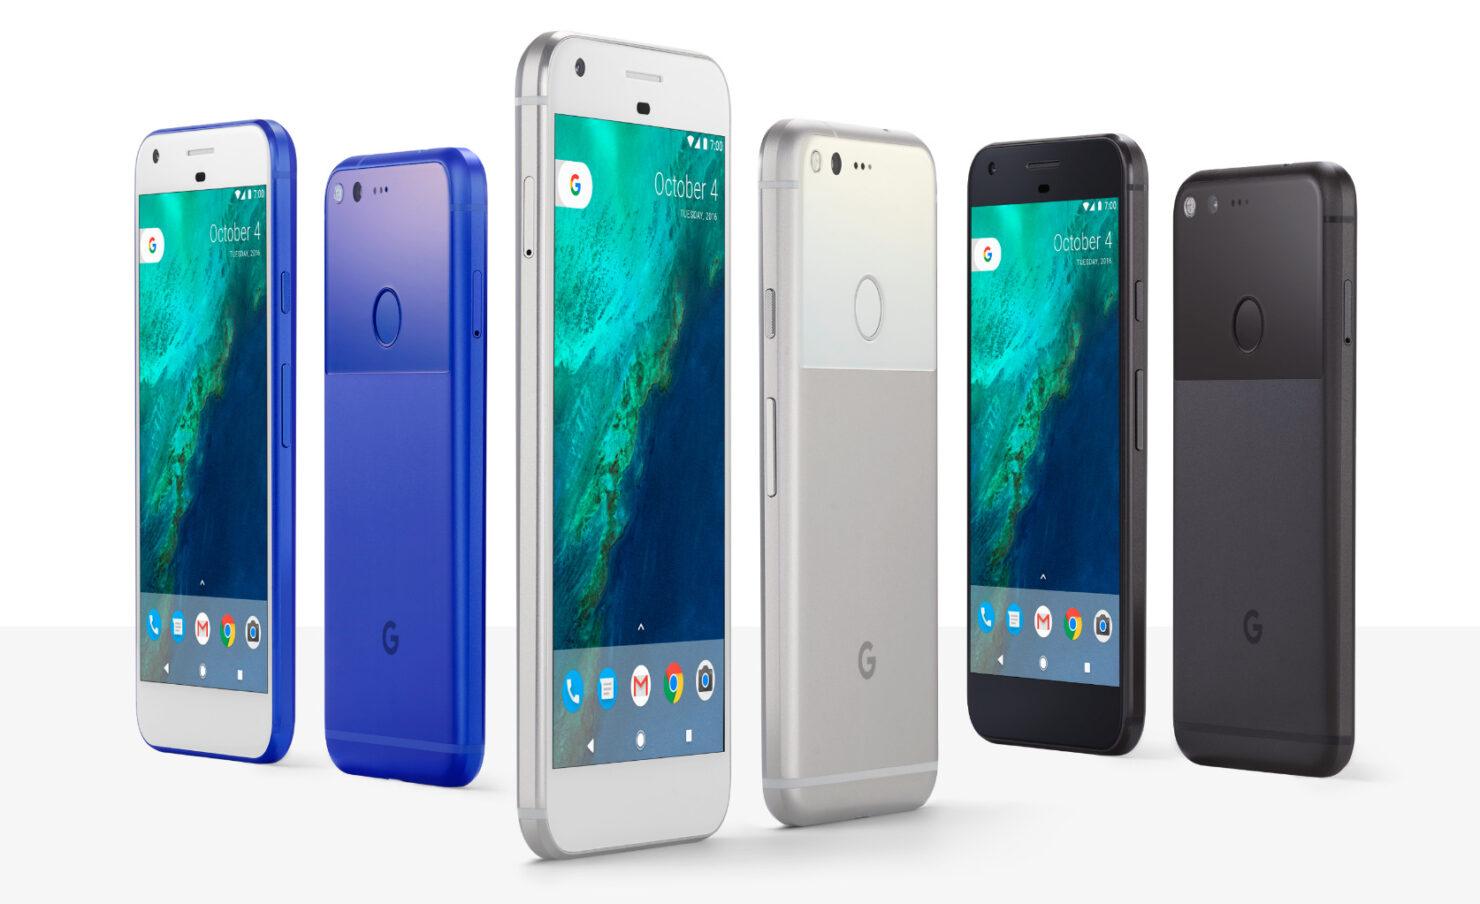 Google announced new Pixel phones